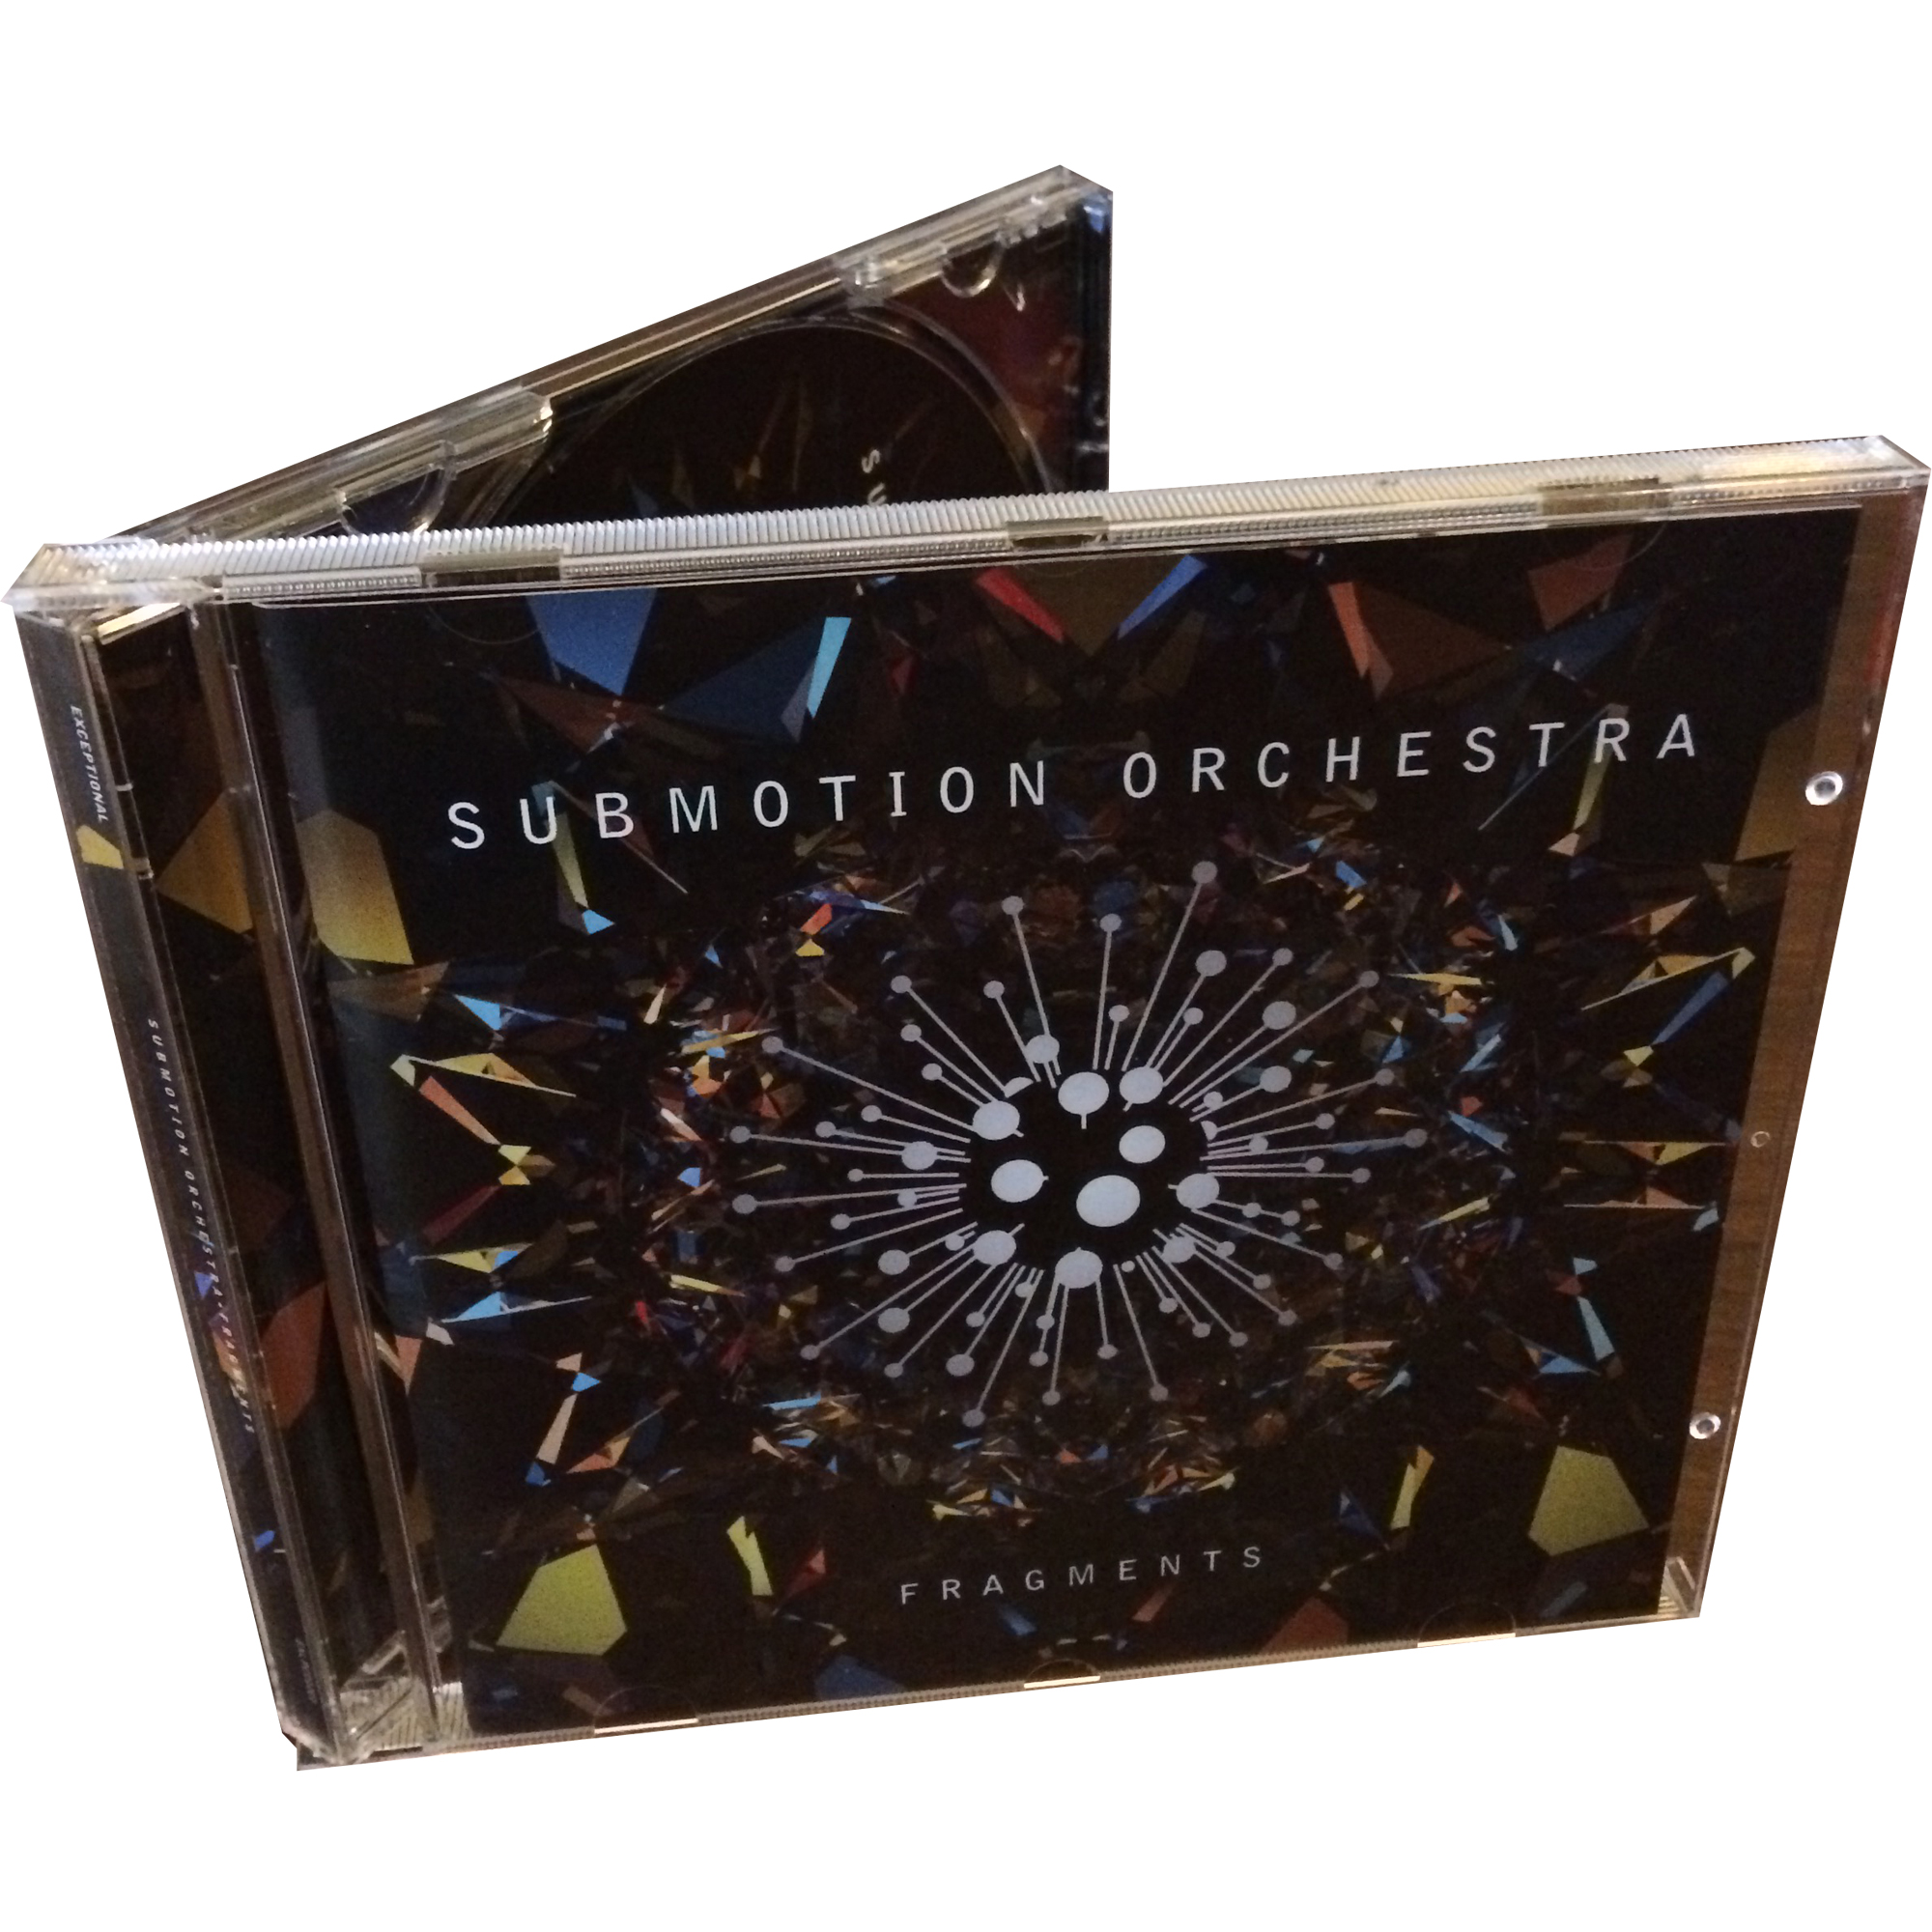 Fragments - CD Album